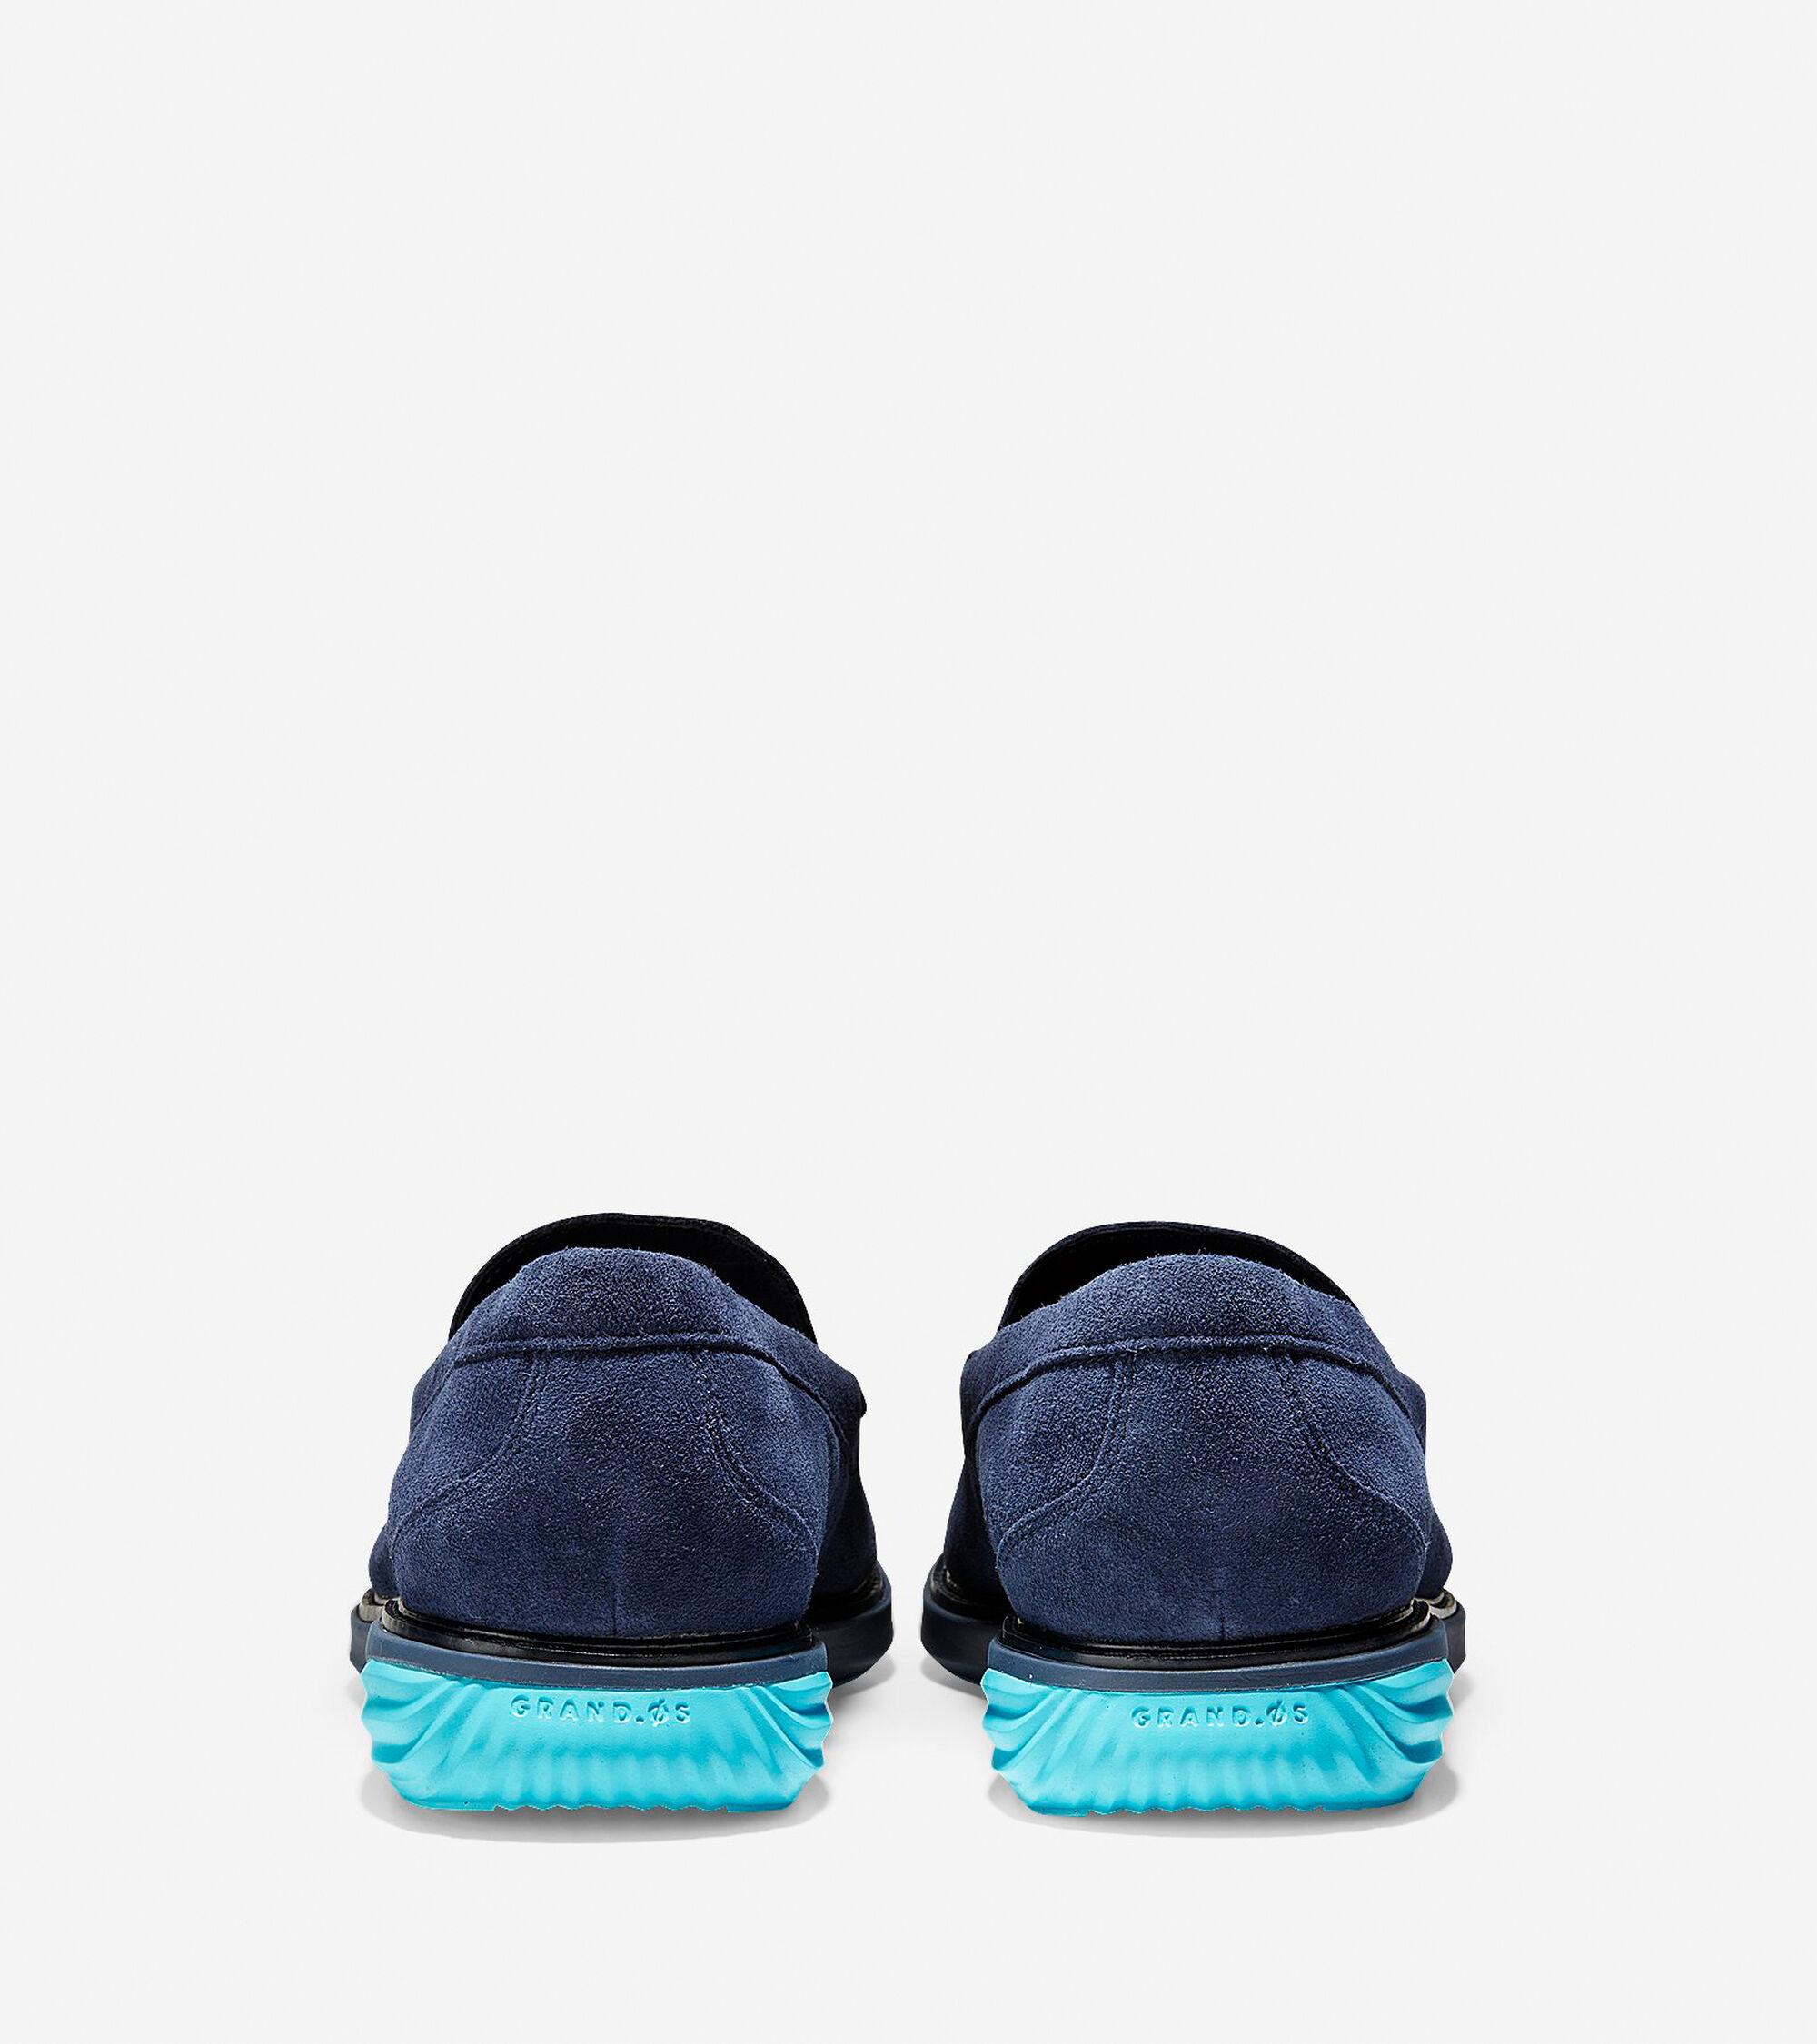 114eff6565d Men s GrandEvolution Venetian Loafers in Marine Blue